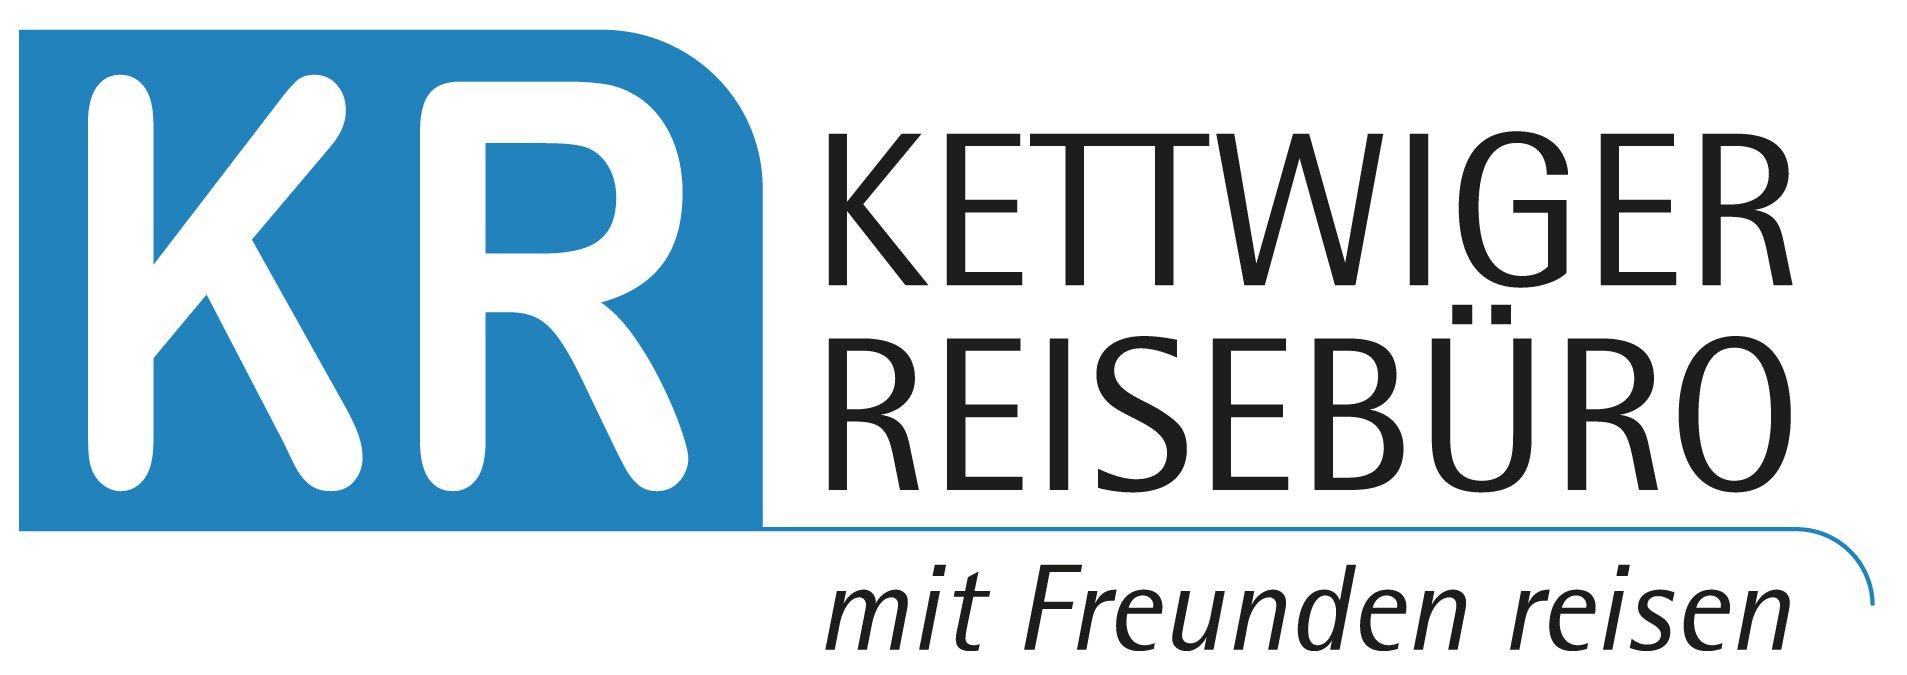 Kettwiger Reisebüro GmbH